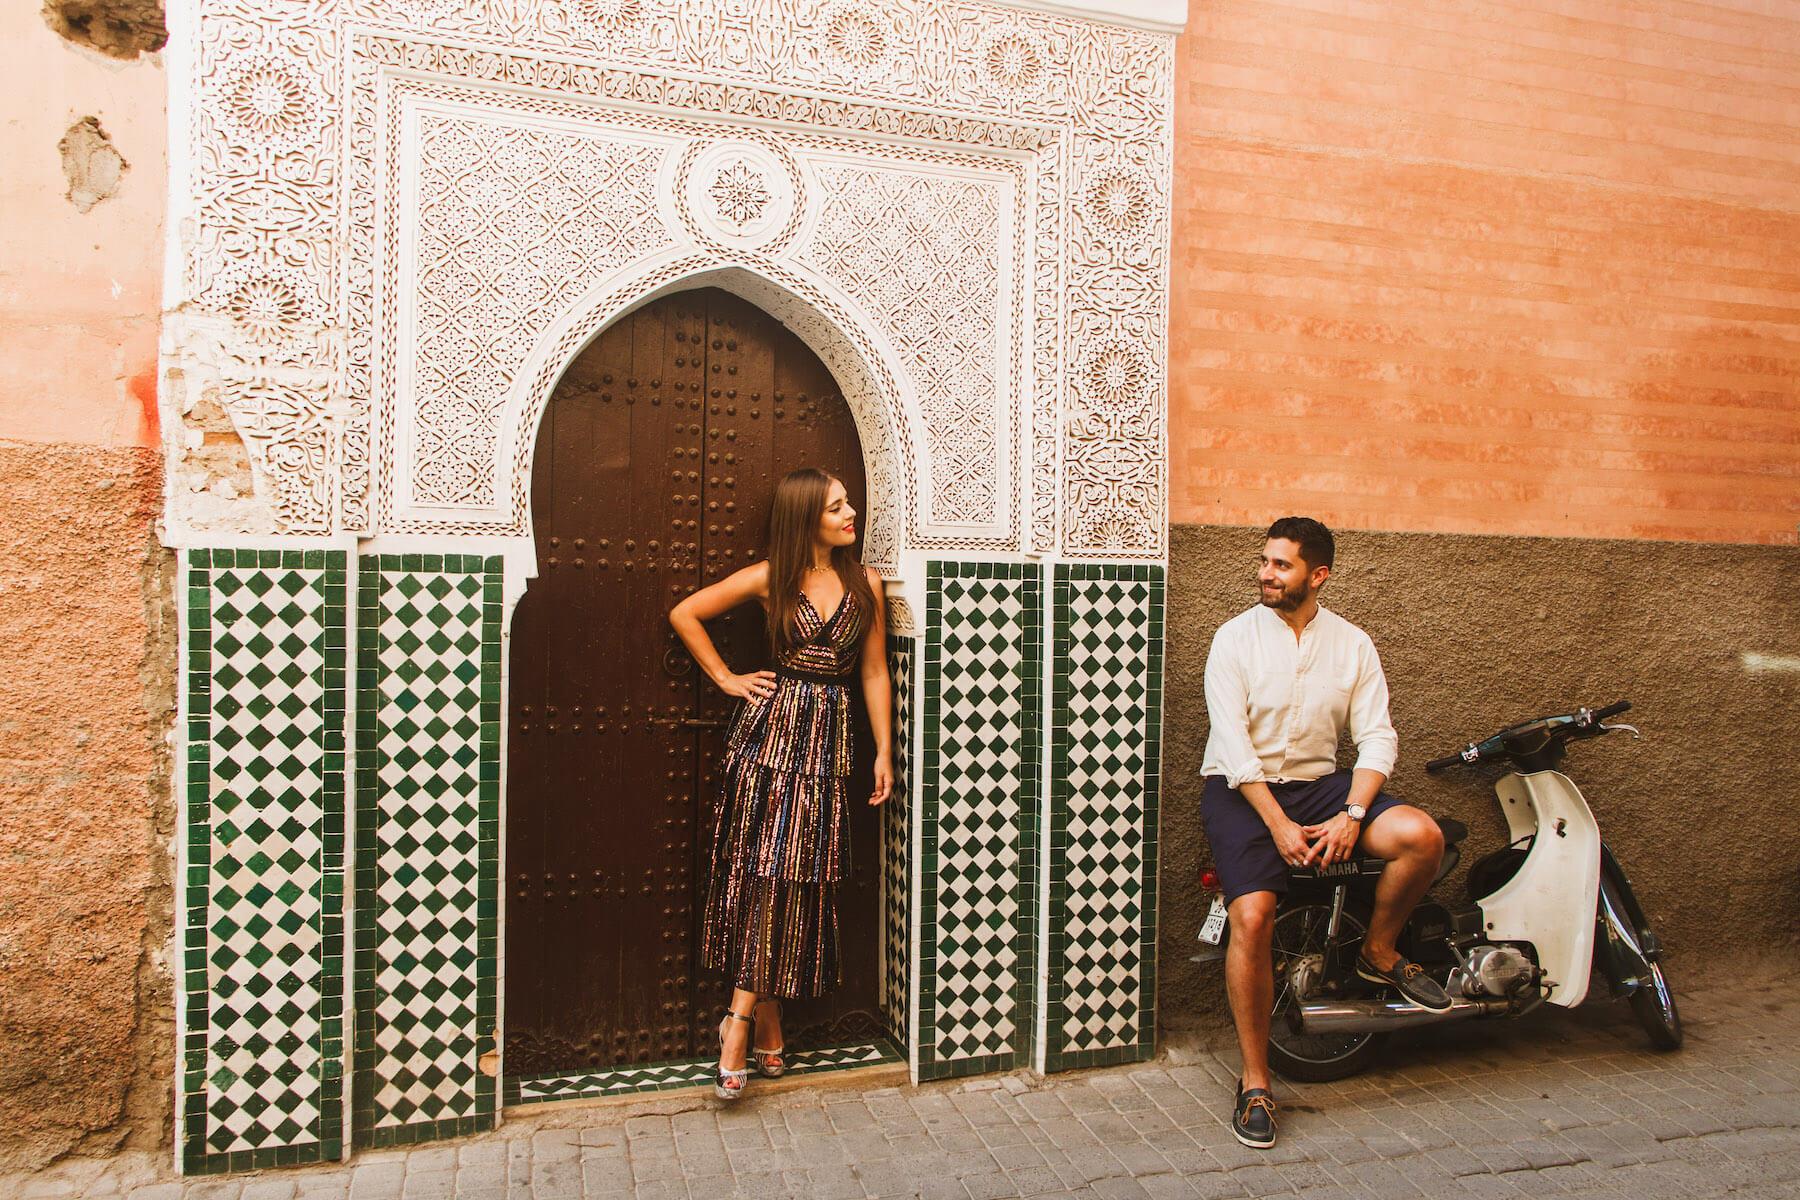 Non-Touristy Romantic Getaways